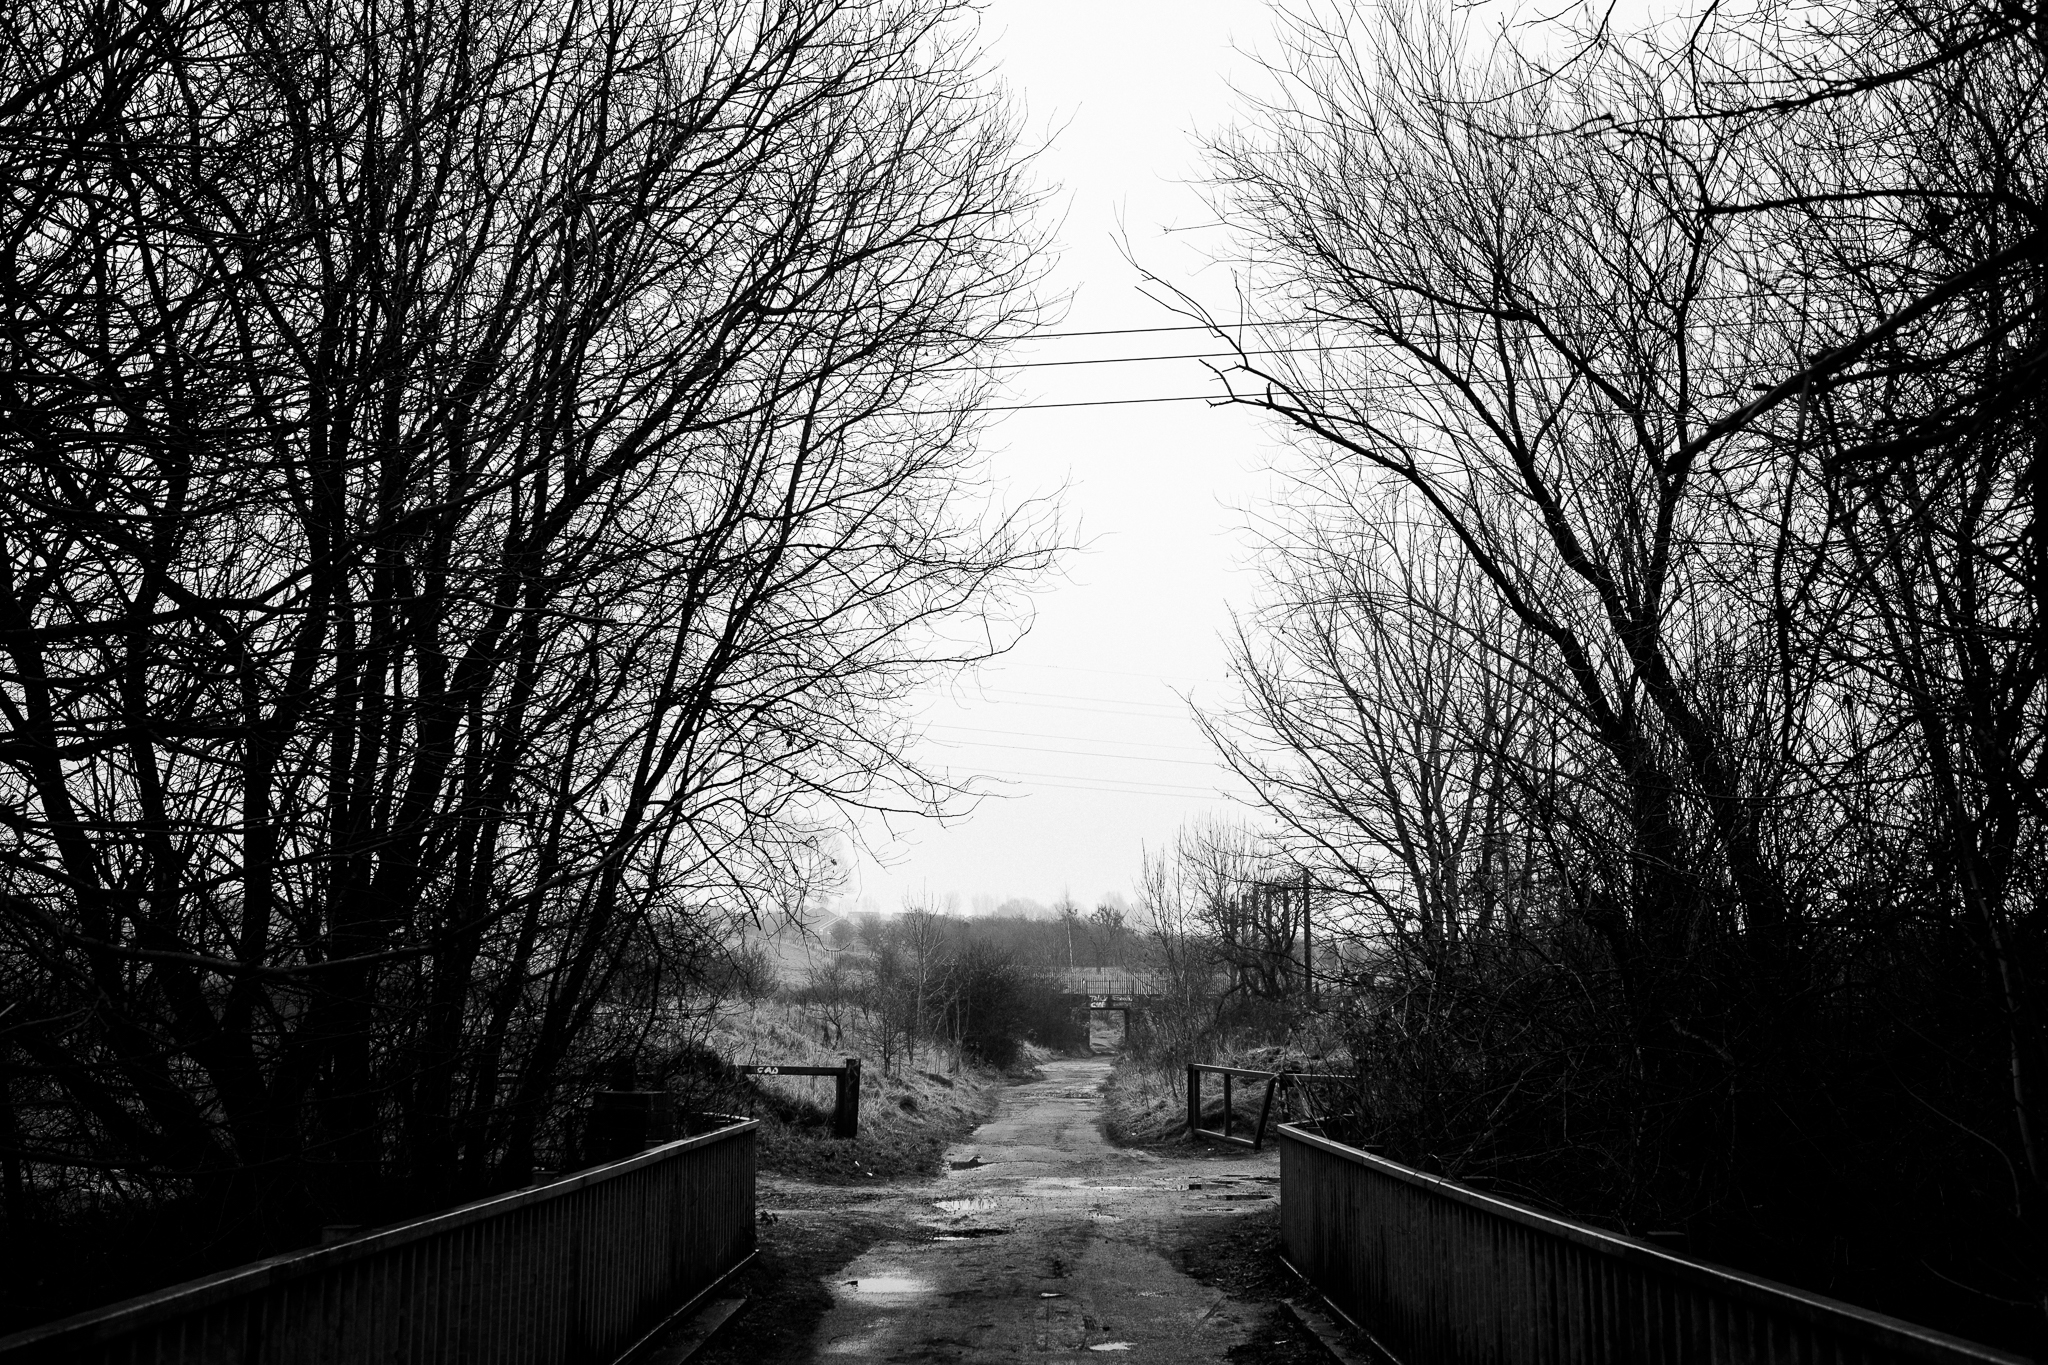 Closer to Home Walk Photowalk Joiner's Square, Hanley, Stoke-on-Trent, Staffordshire Winter Nature Reserve-8.jpg